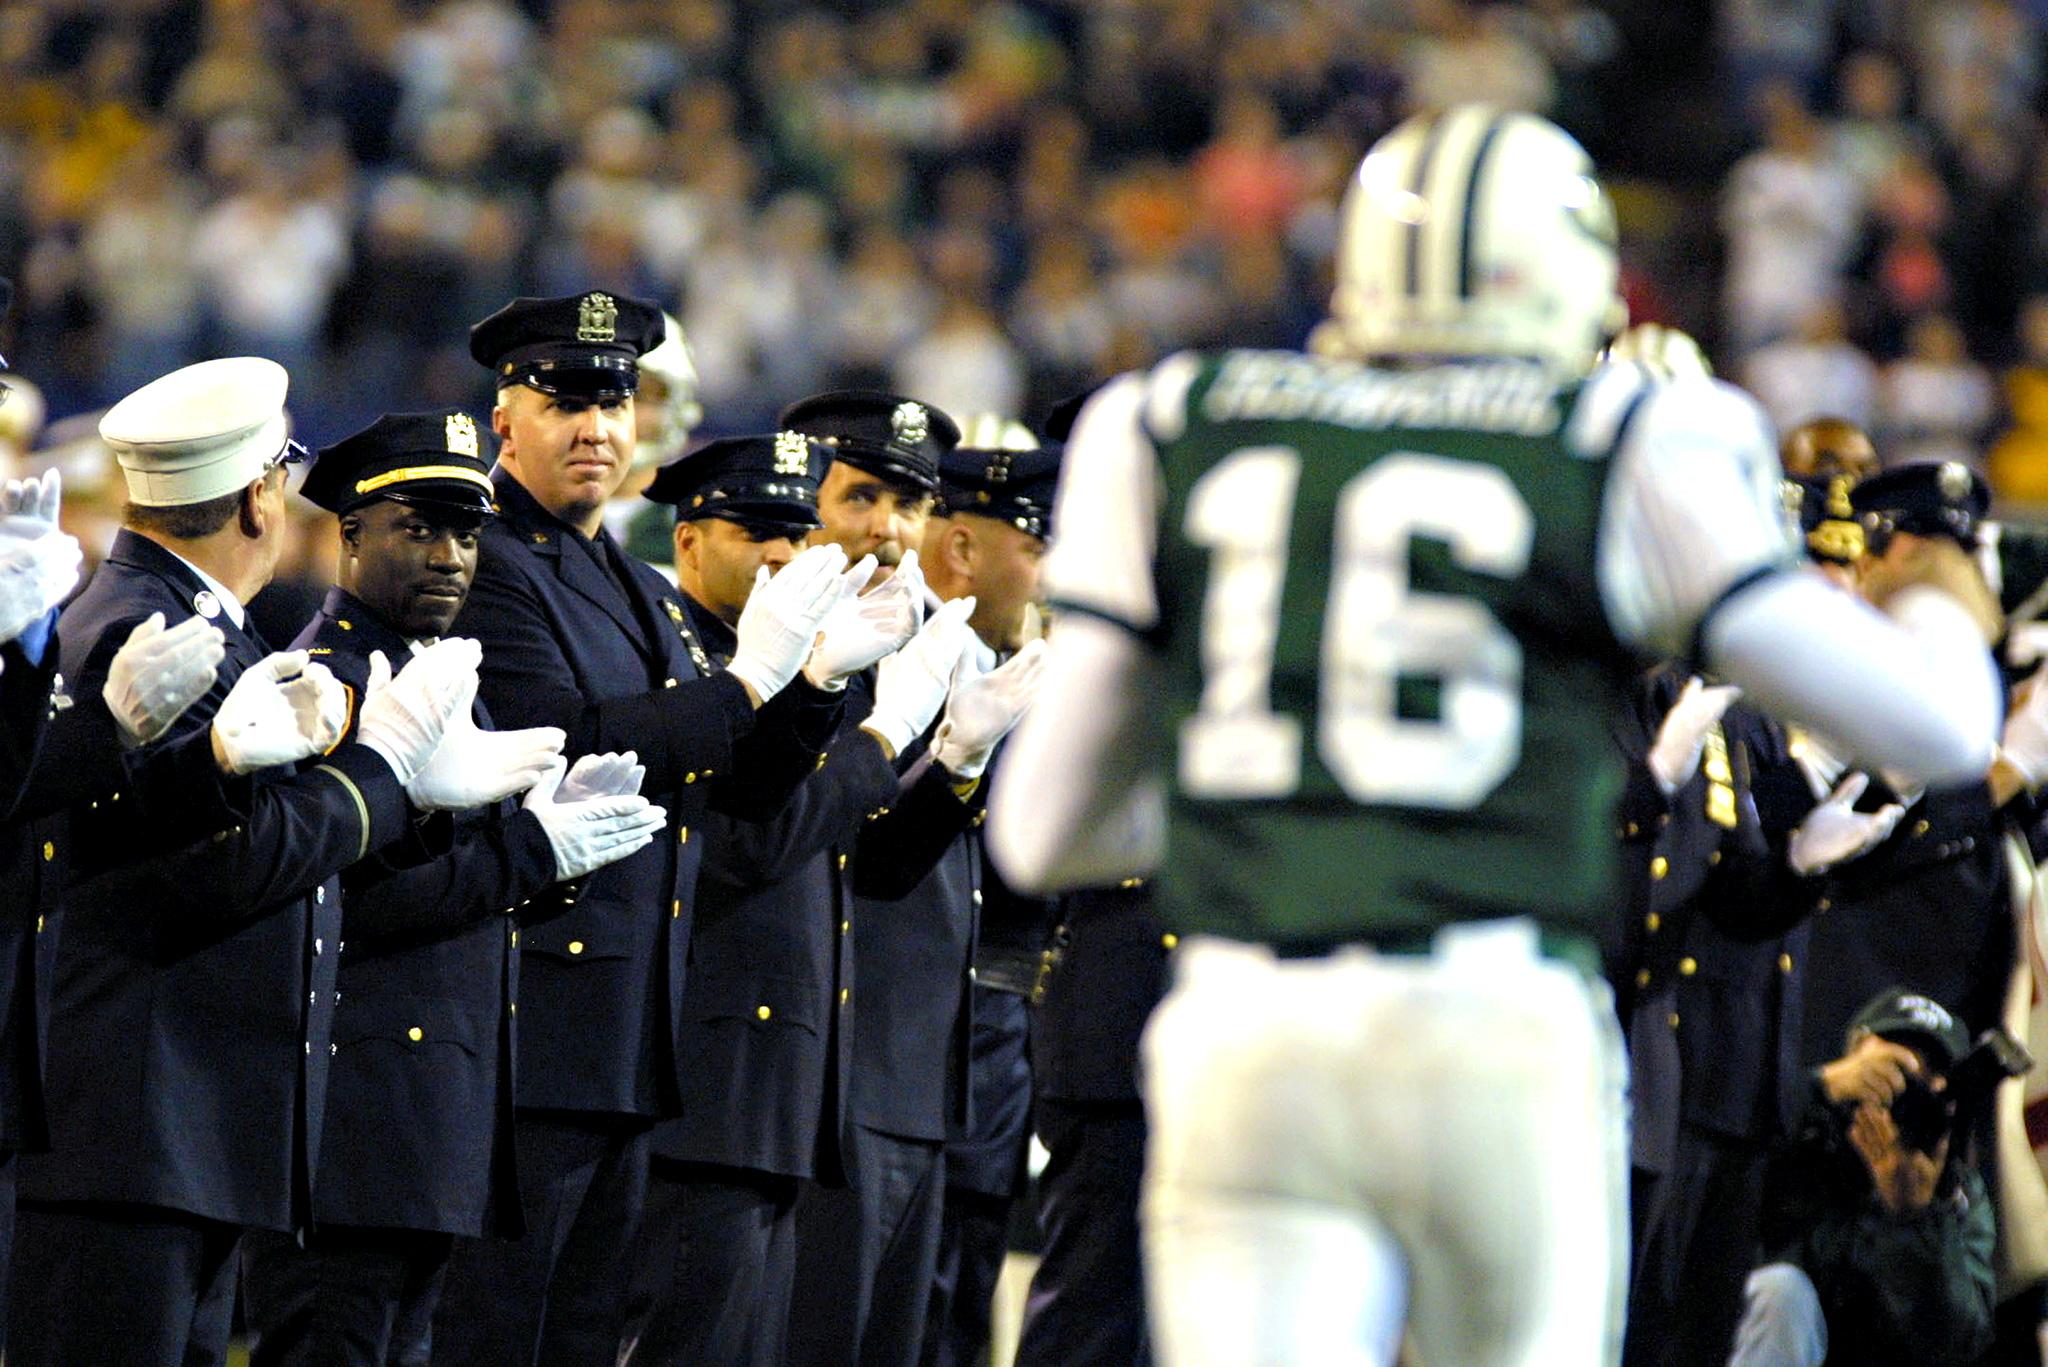 Jets vs. 49ers